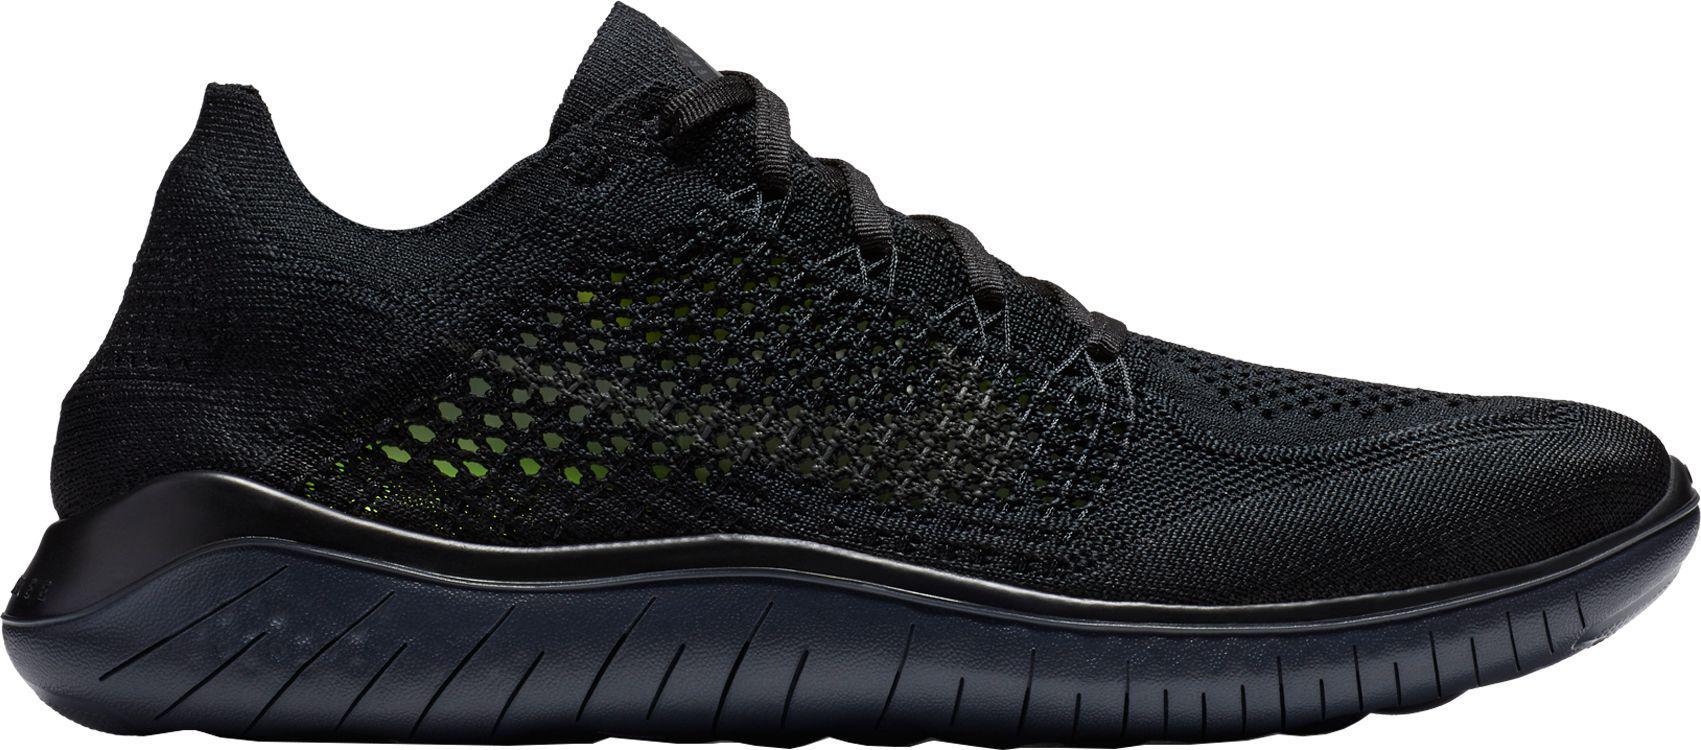 2107629036e6f Lyst - Nike Free Rn Flyknit 2018 Running Shoes in Black for Men